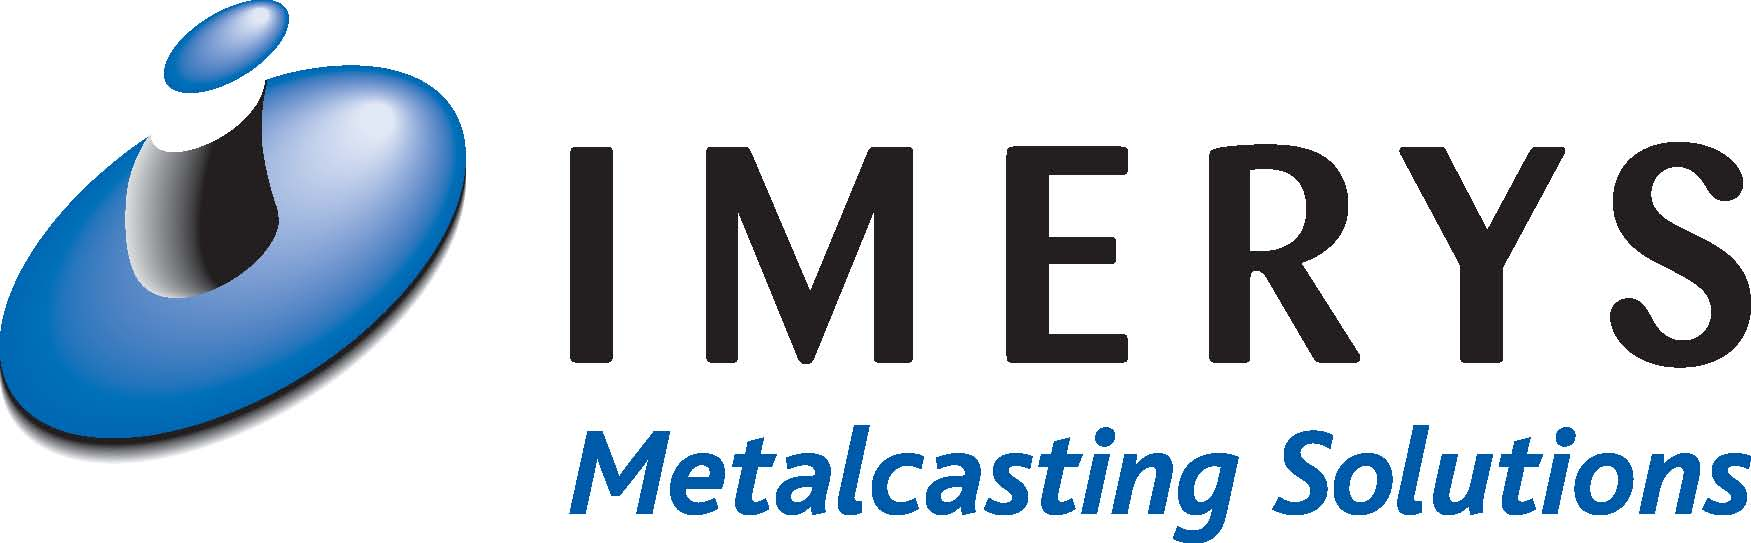 Imerys Metalcasting